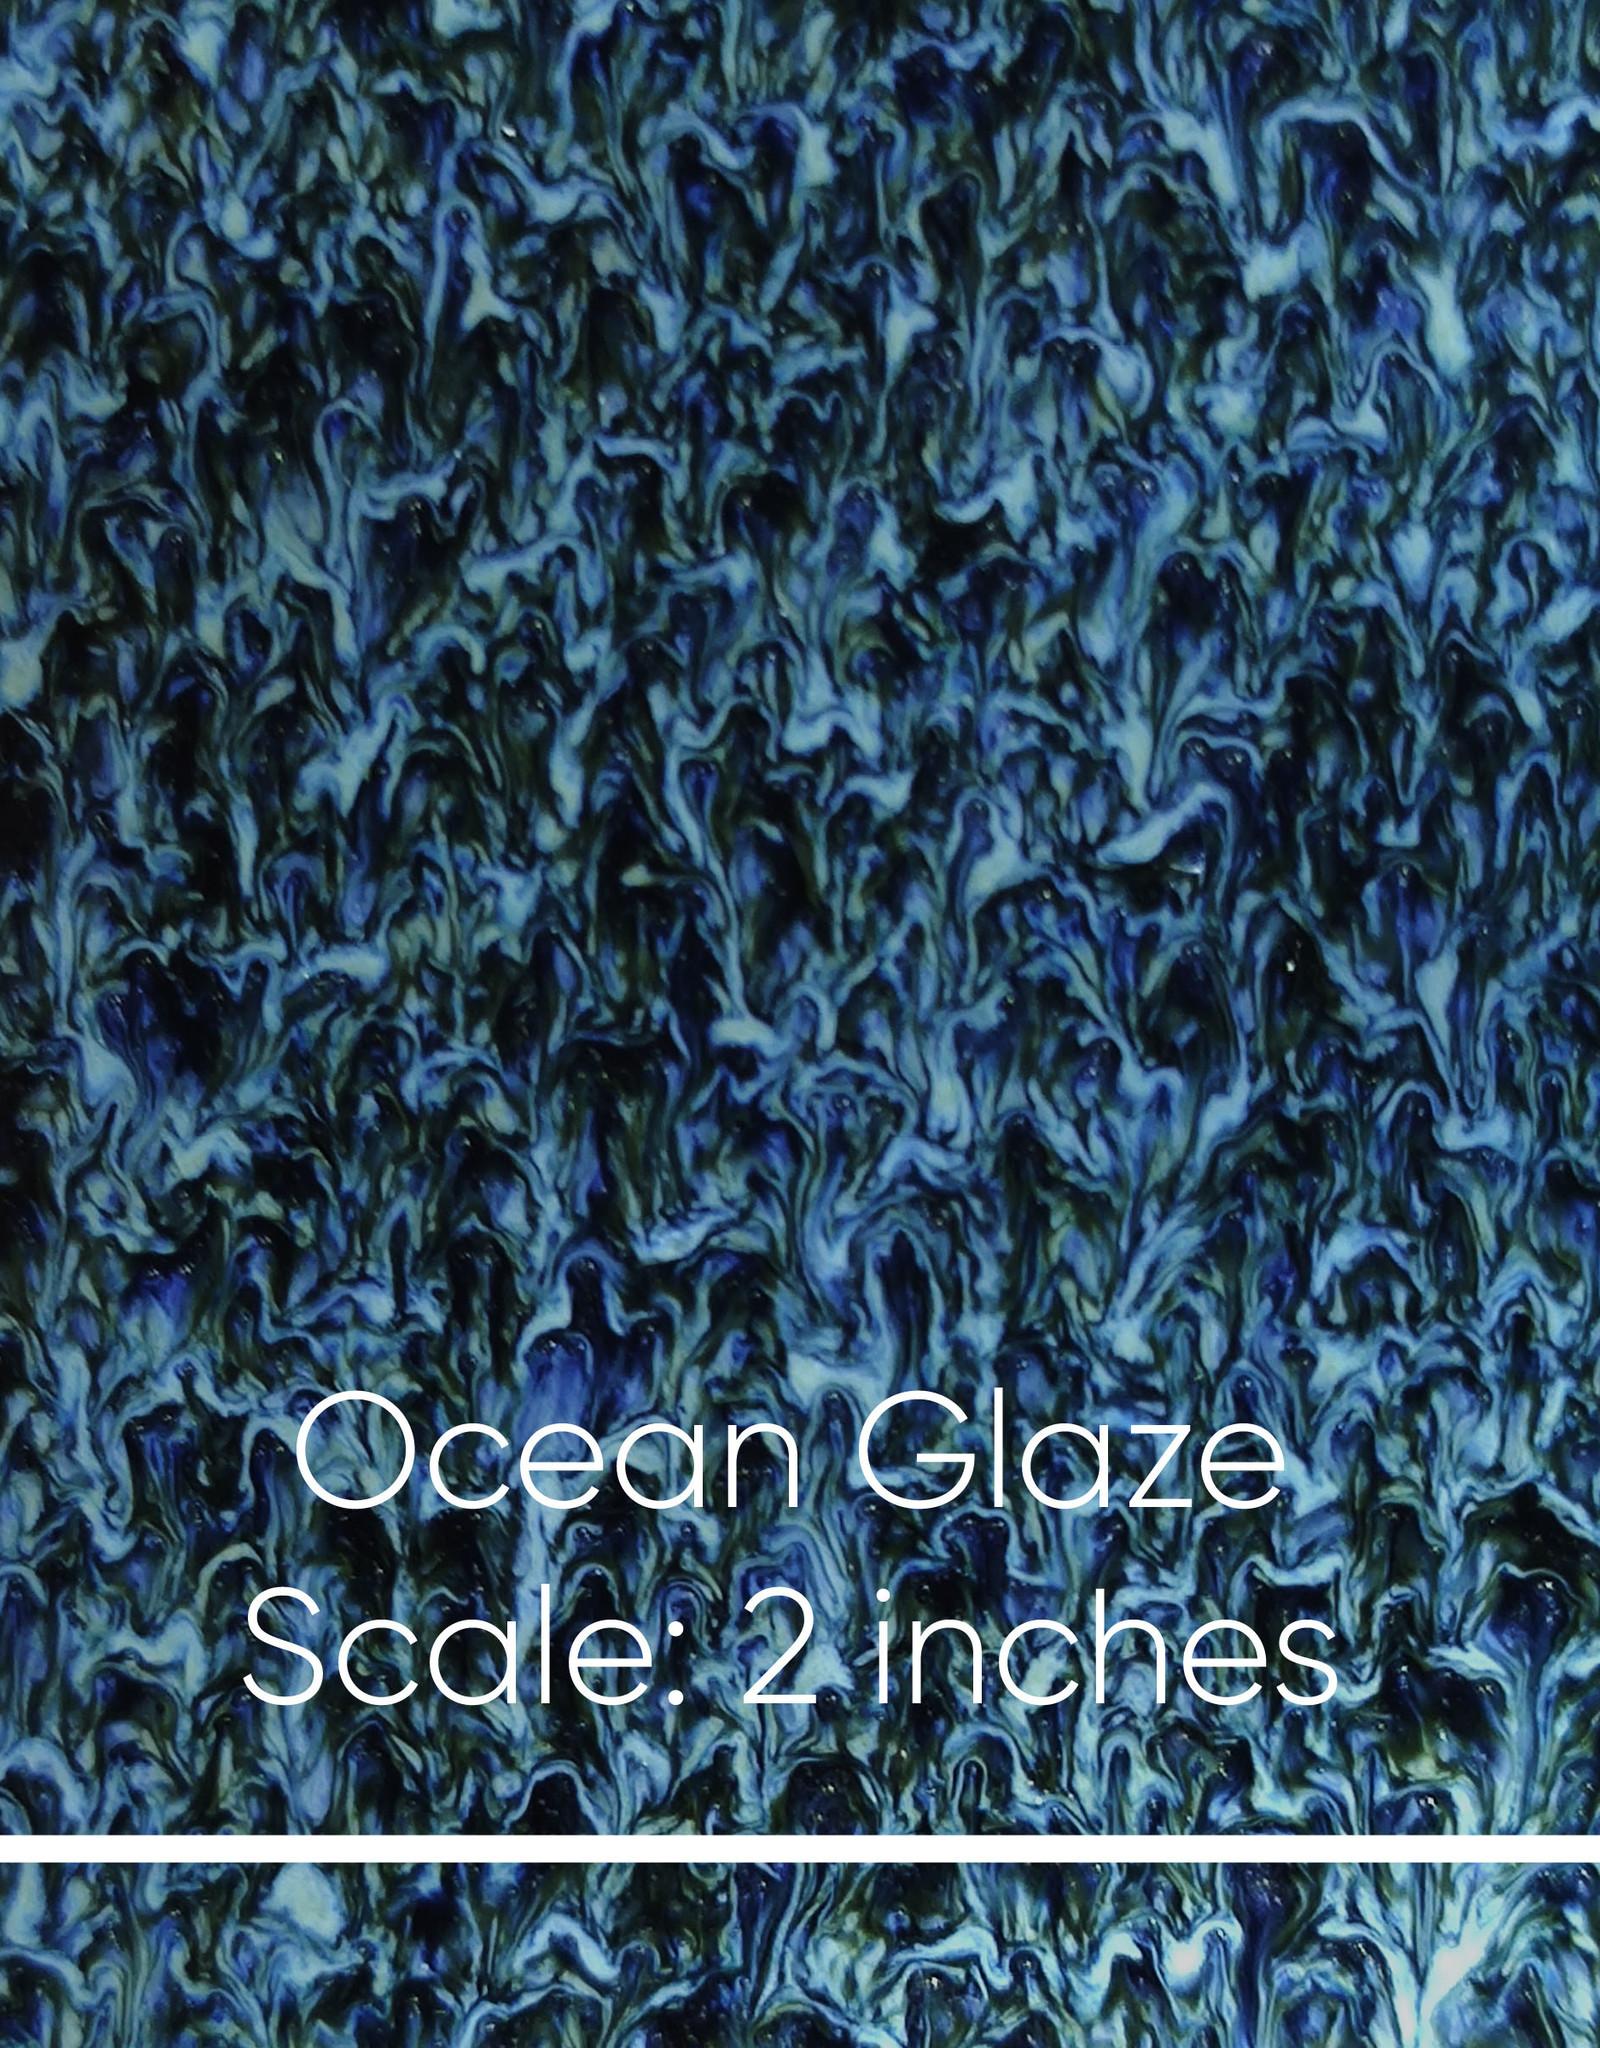 Lawrence & Scott Sybil Porcelain Table Lamp in Ocean Glaze